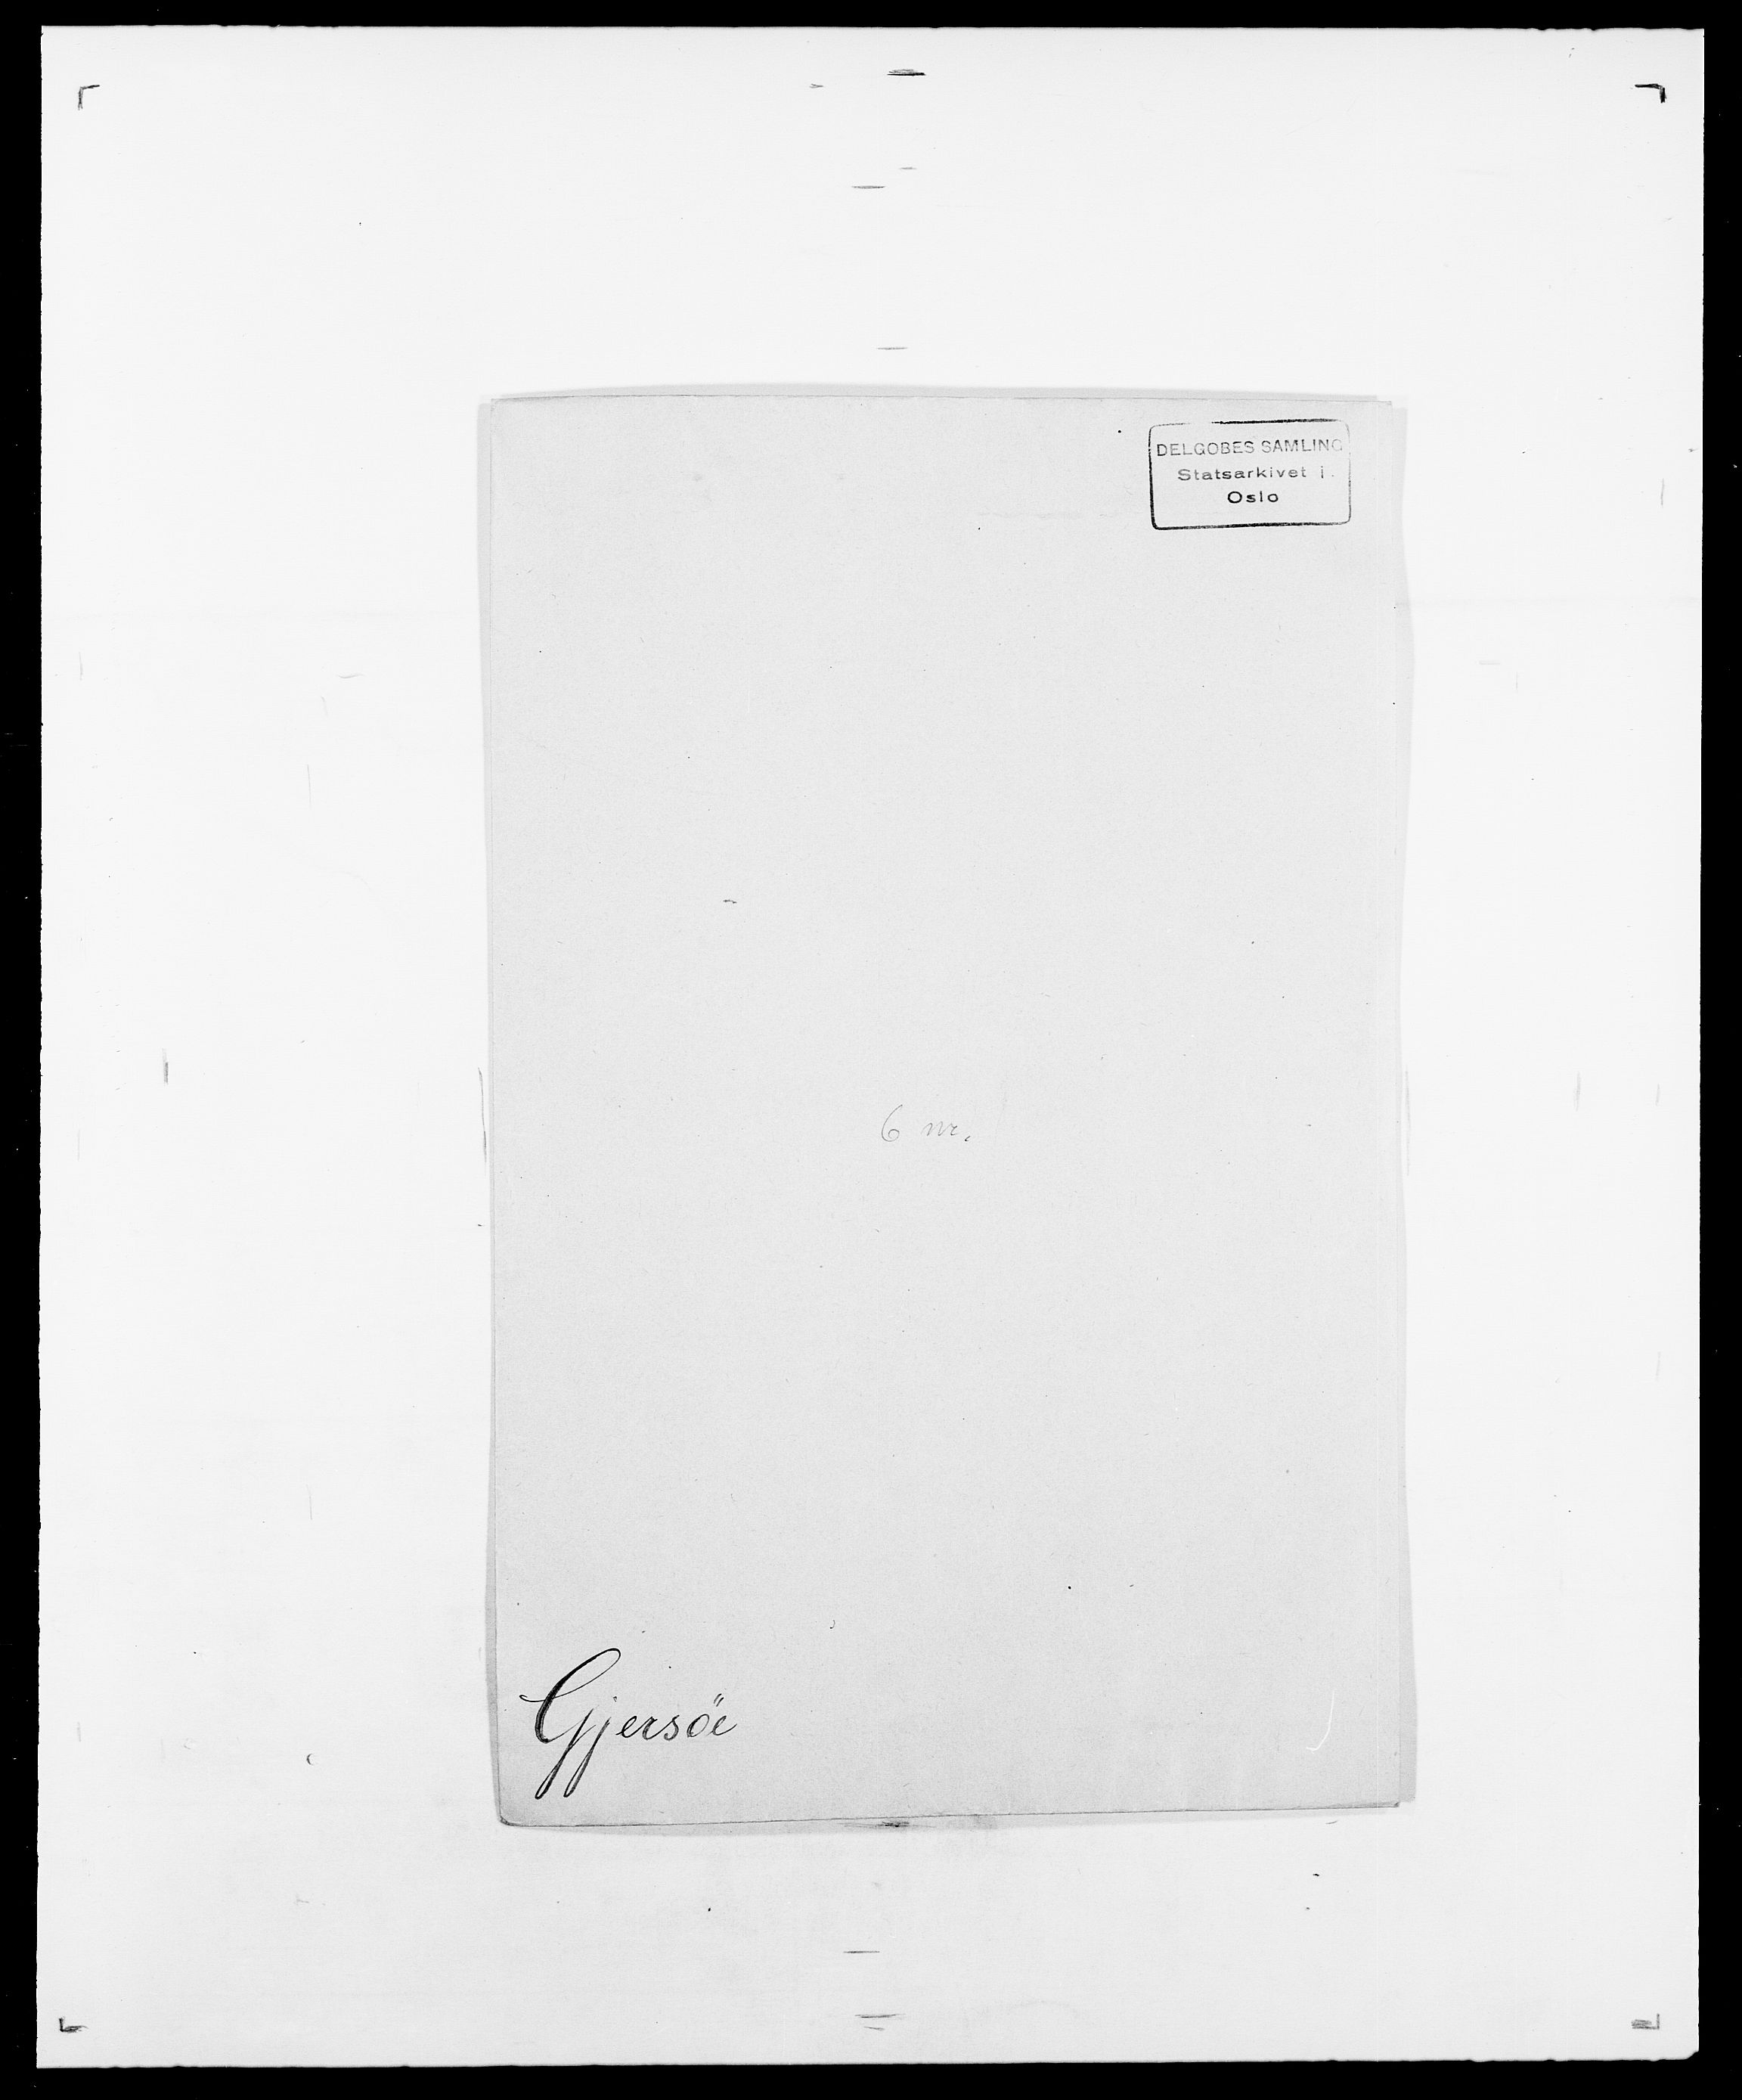 SAO, Delgobe, Charles Antoine - samling, D/Da/L0014: Giebdhausen - Grip, s. 155